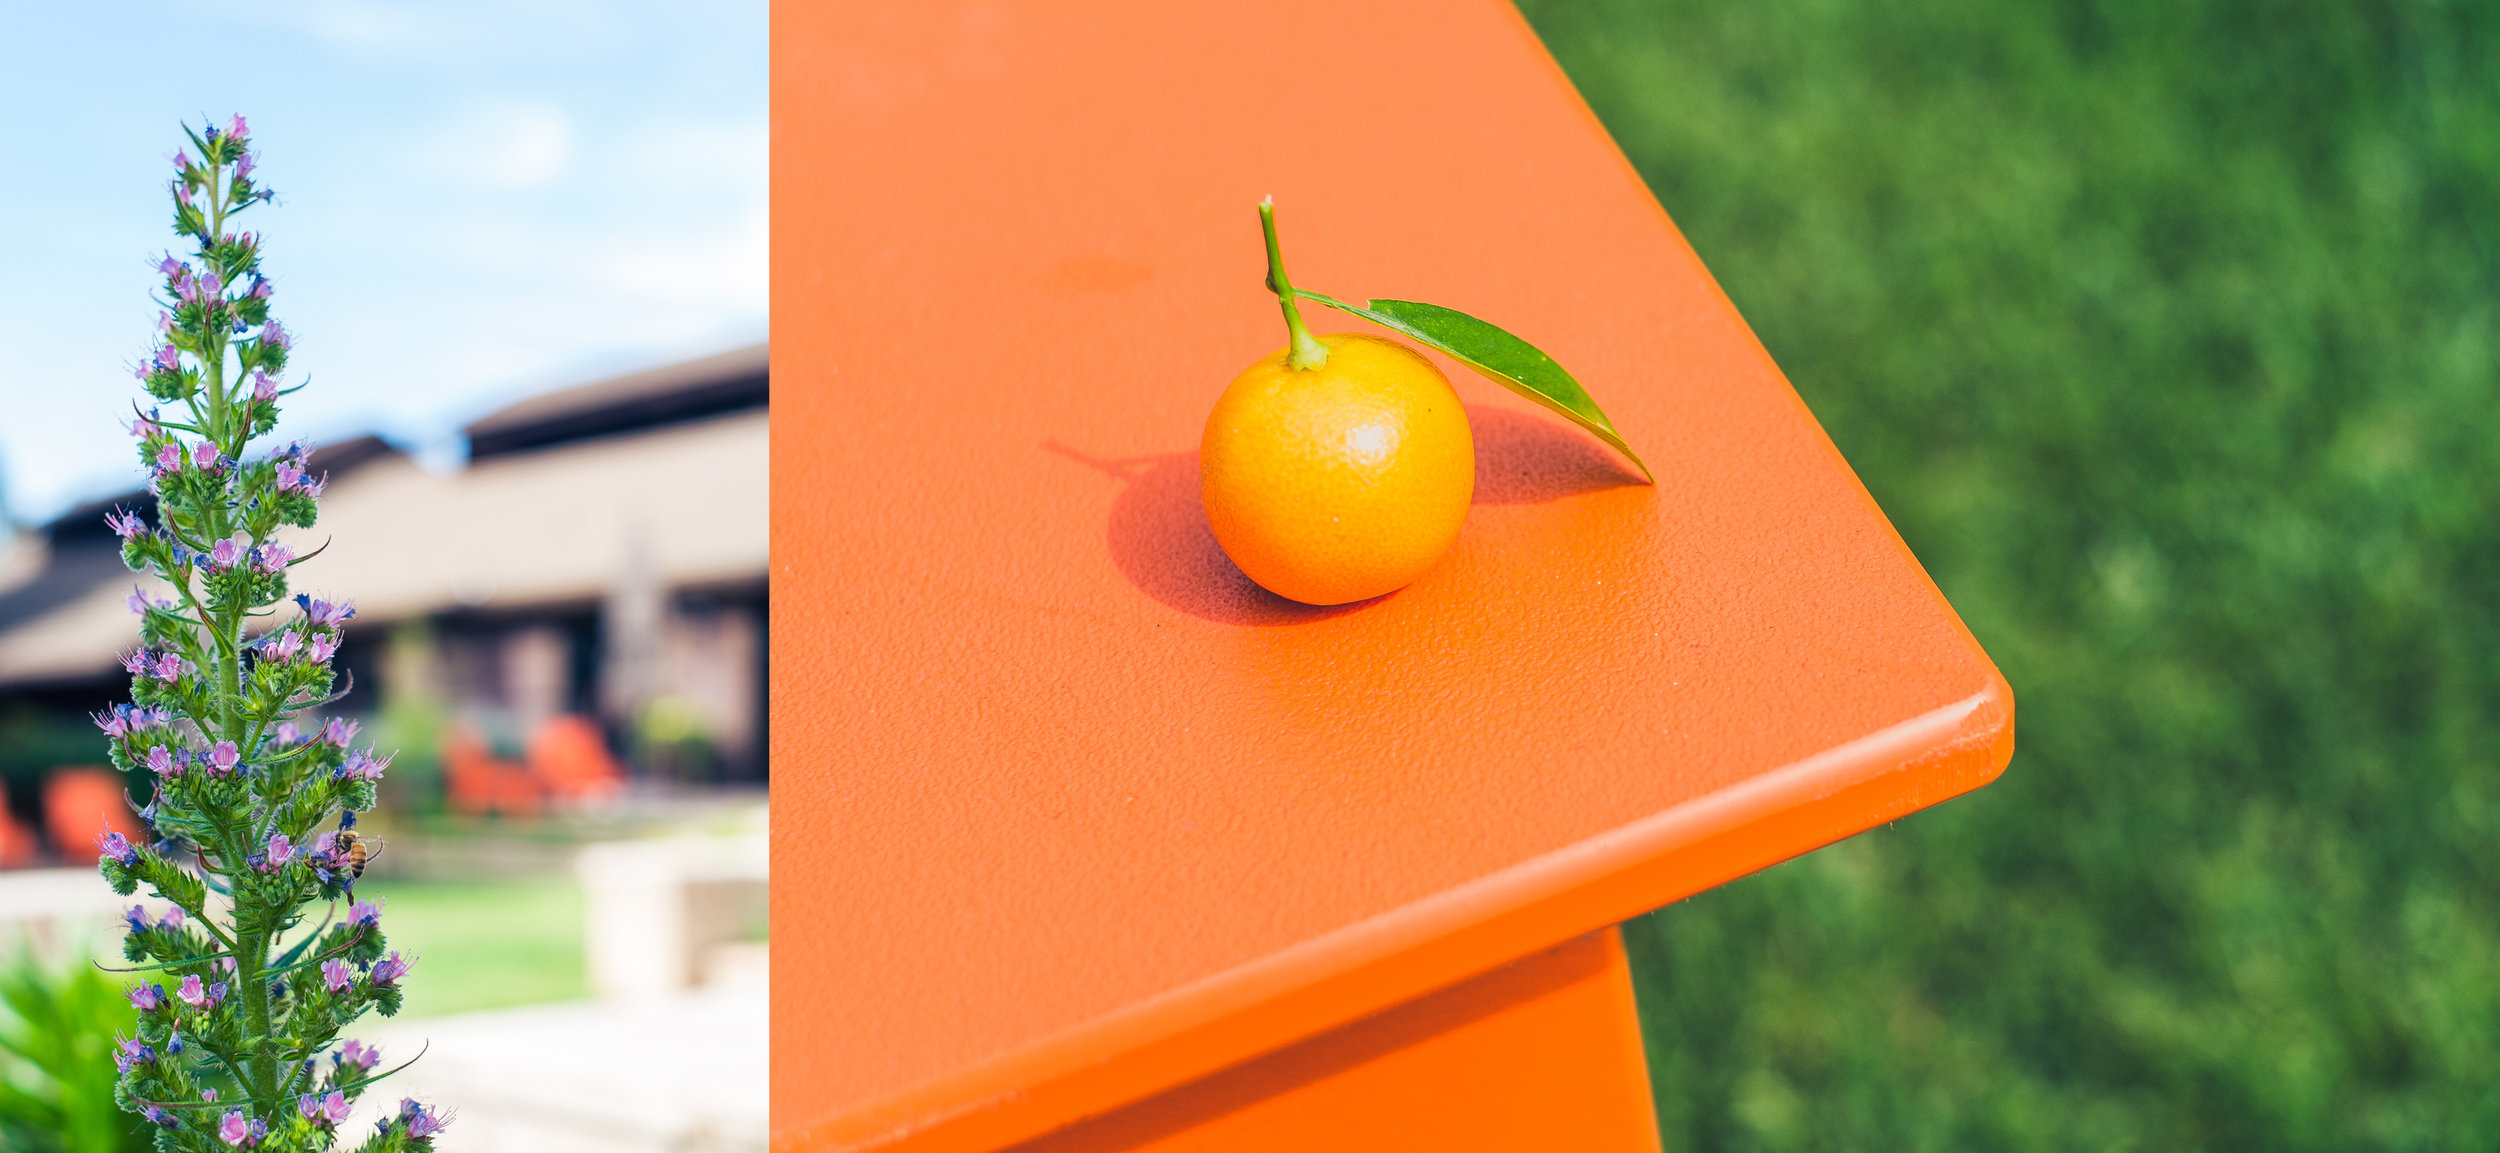 The VML tasting room & an unidentified citrus fruit on an orange table